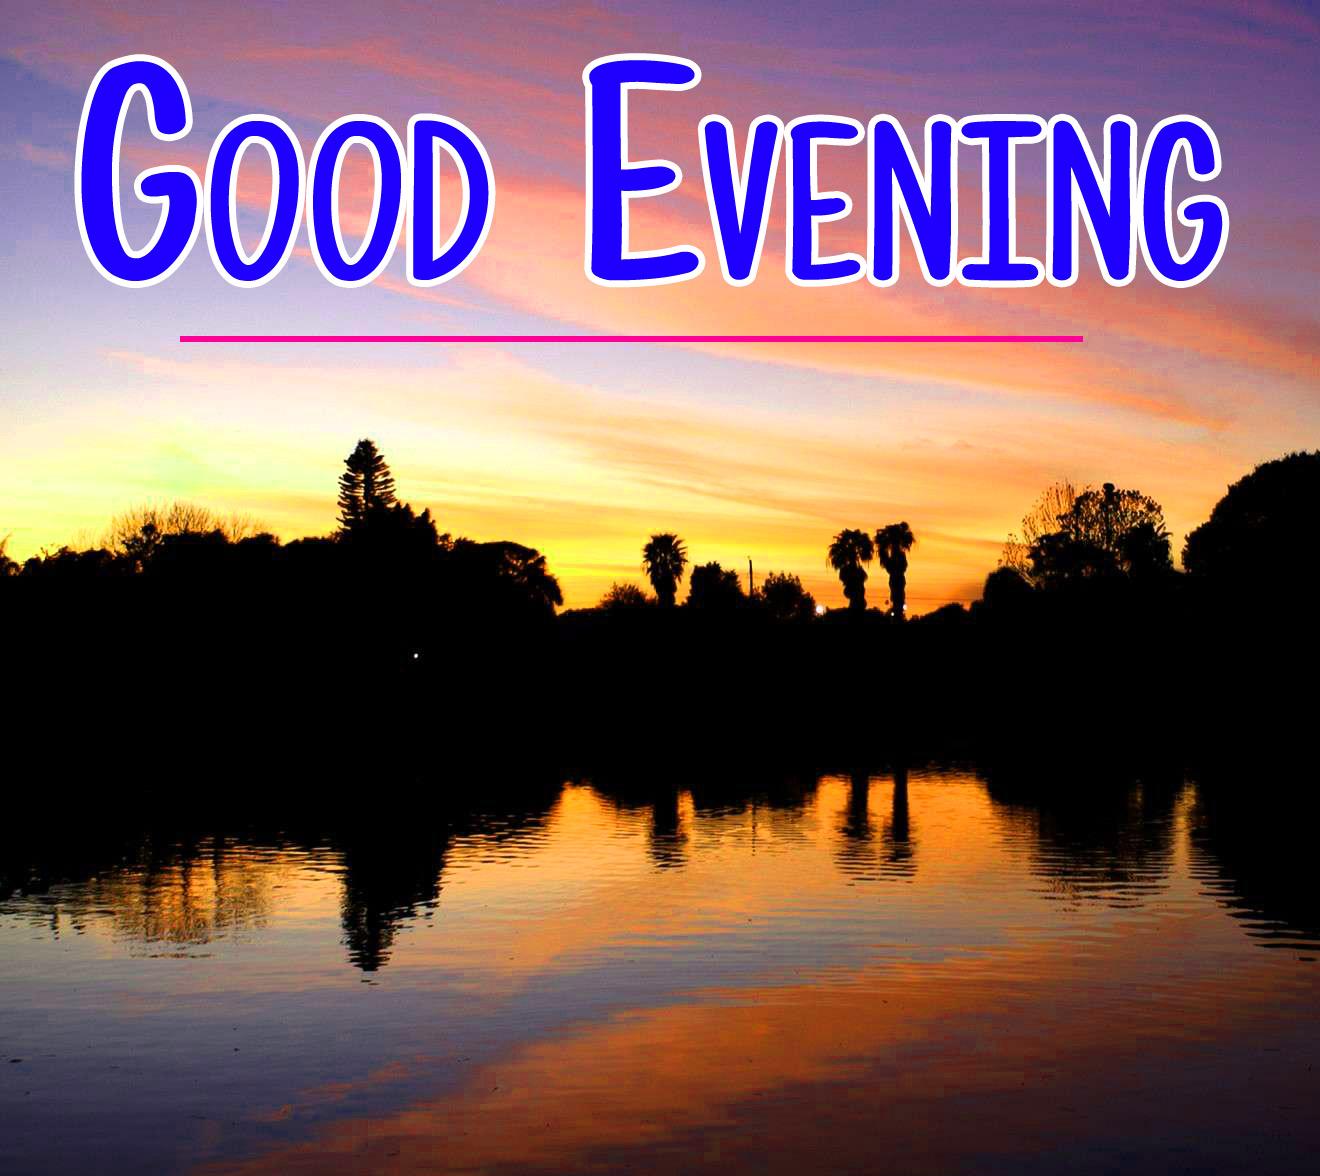 good evening photo 15